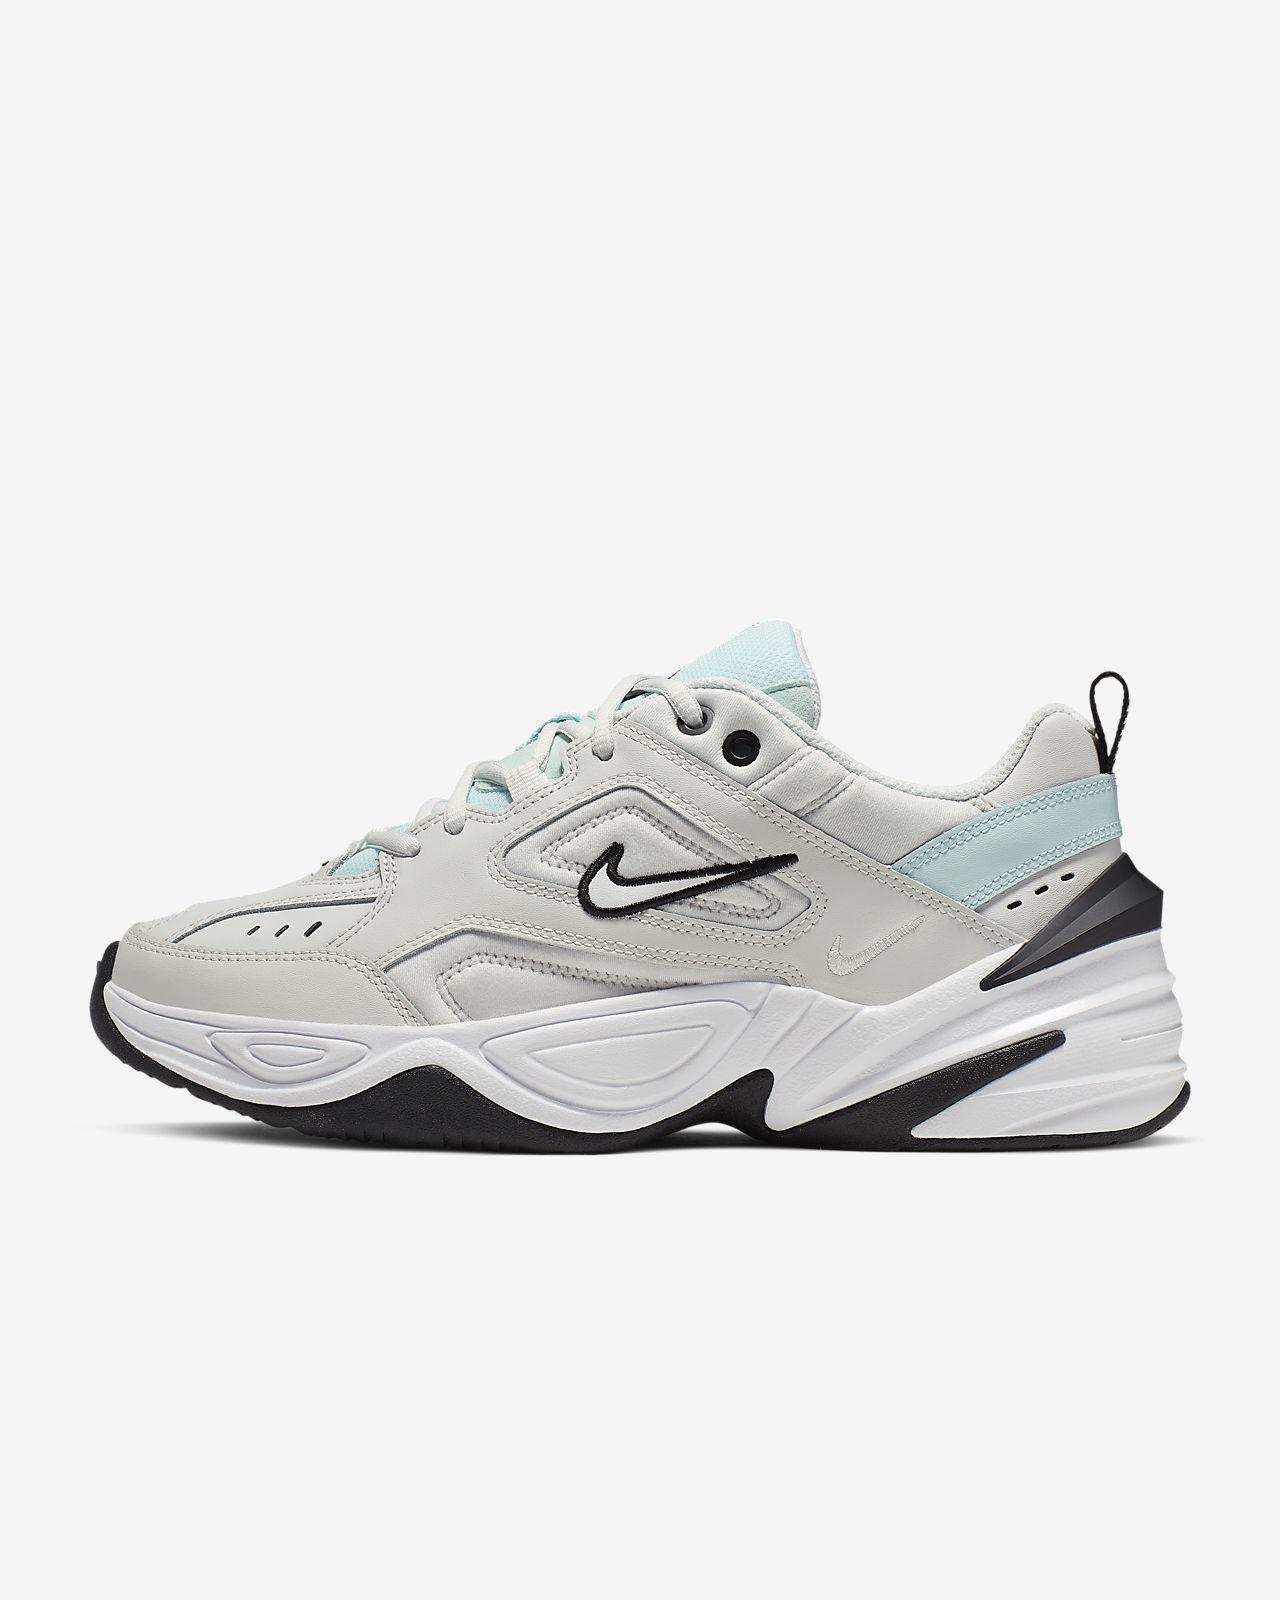 low priced 59f60 0ccf9 Low Resolution Scarpa Nike M2K Tekno Scarpa Nike M2K Tekno